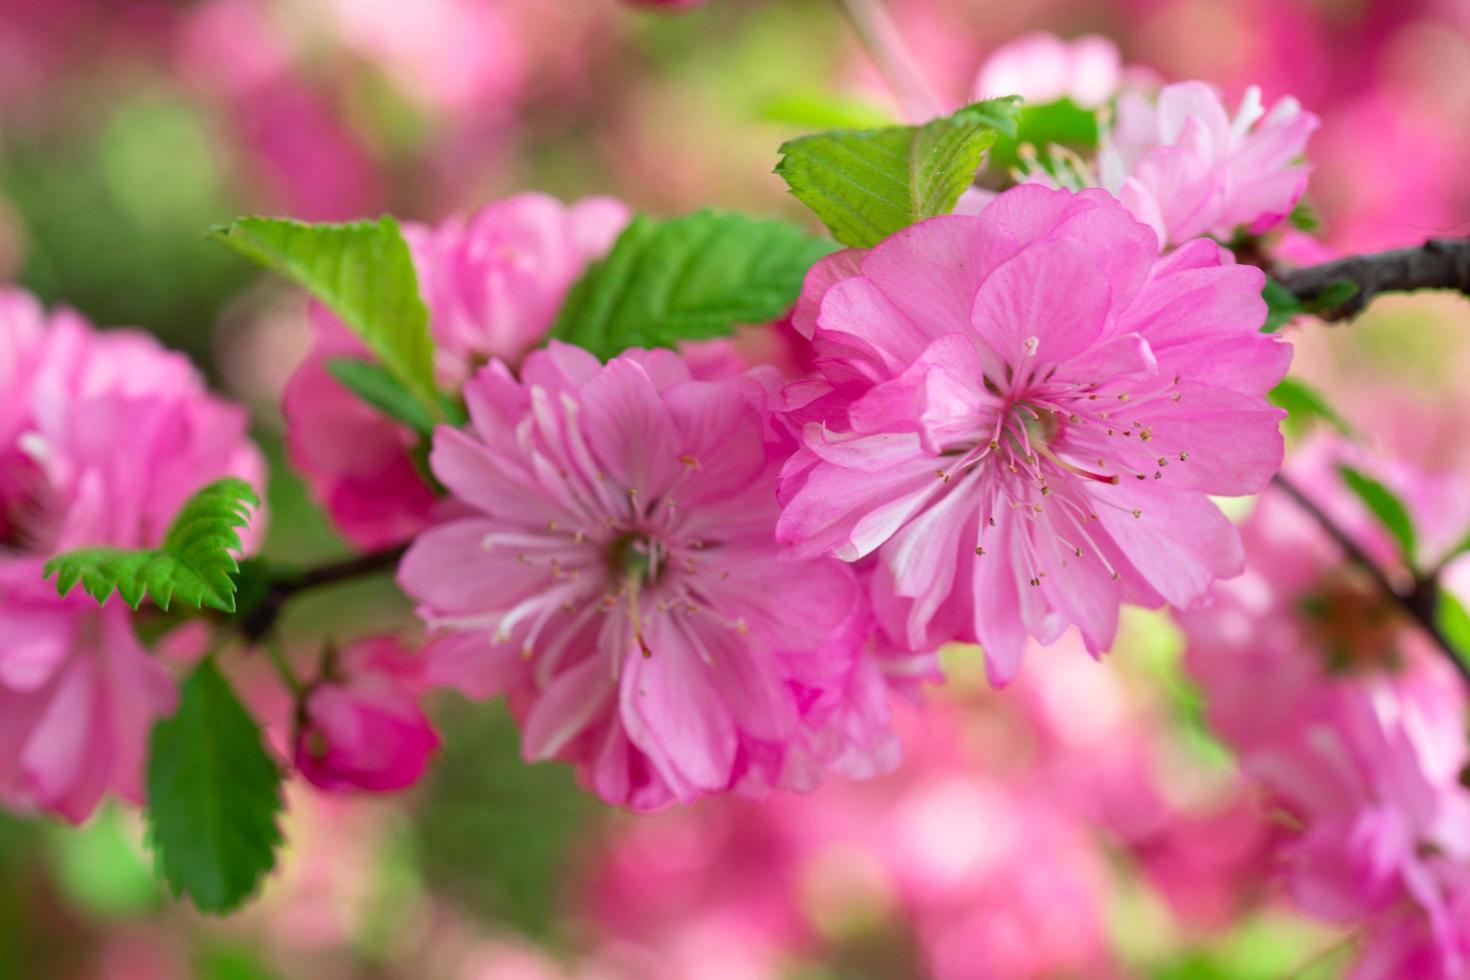 vacker blommig rosa bakgrund av sakura blommor foto